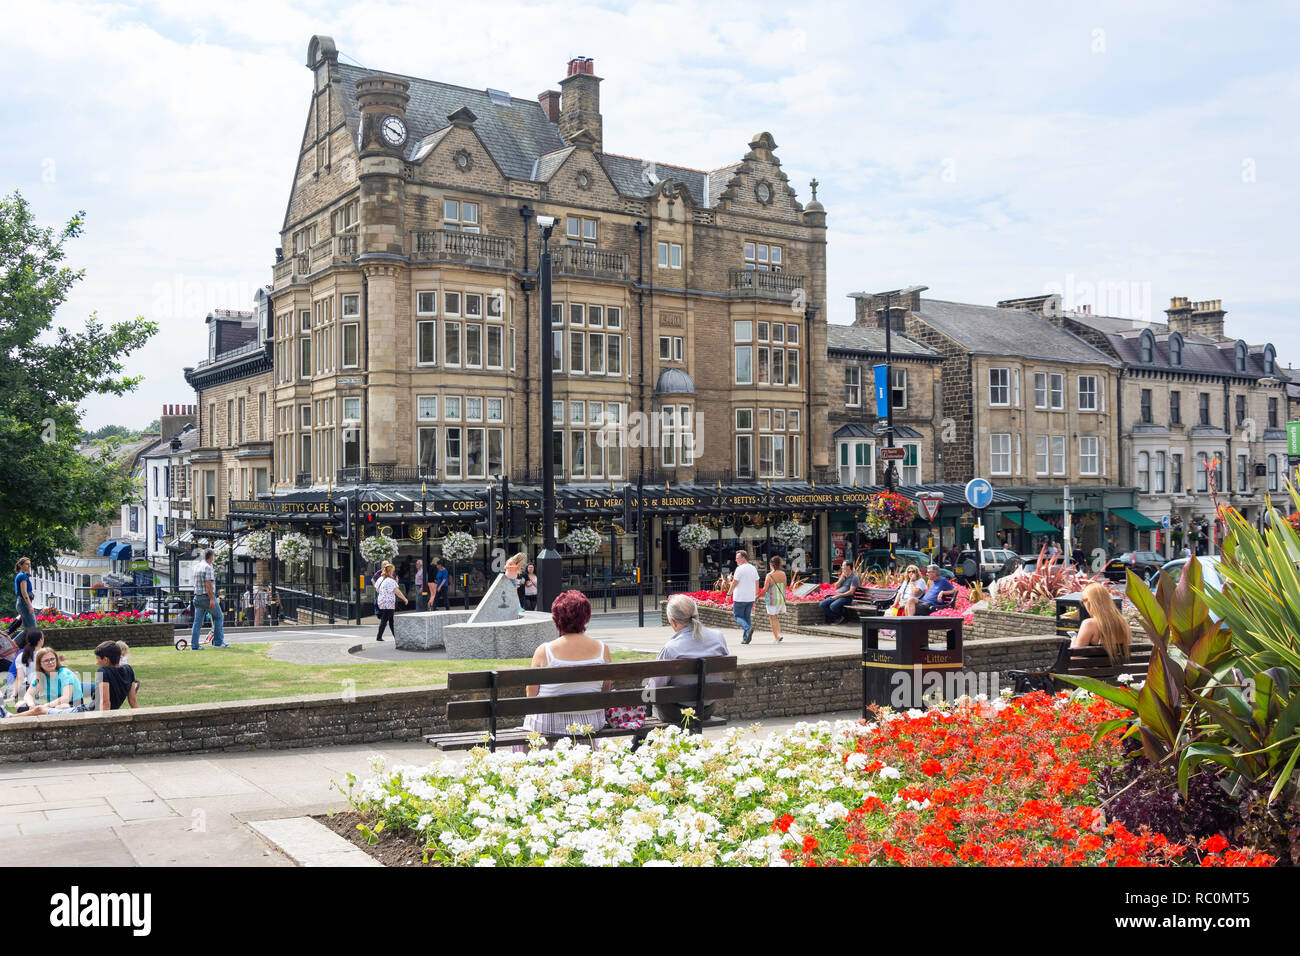 Betty's Tearooms, Parliament Street, Montpellier Quarter, Harrogate, North Yorkshire, England, United Kingdom Stock Photo